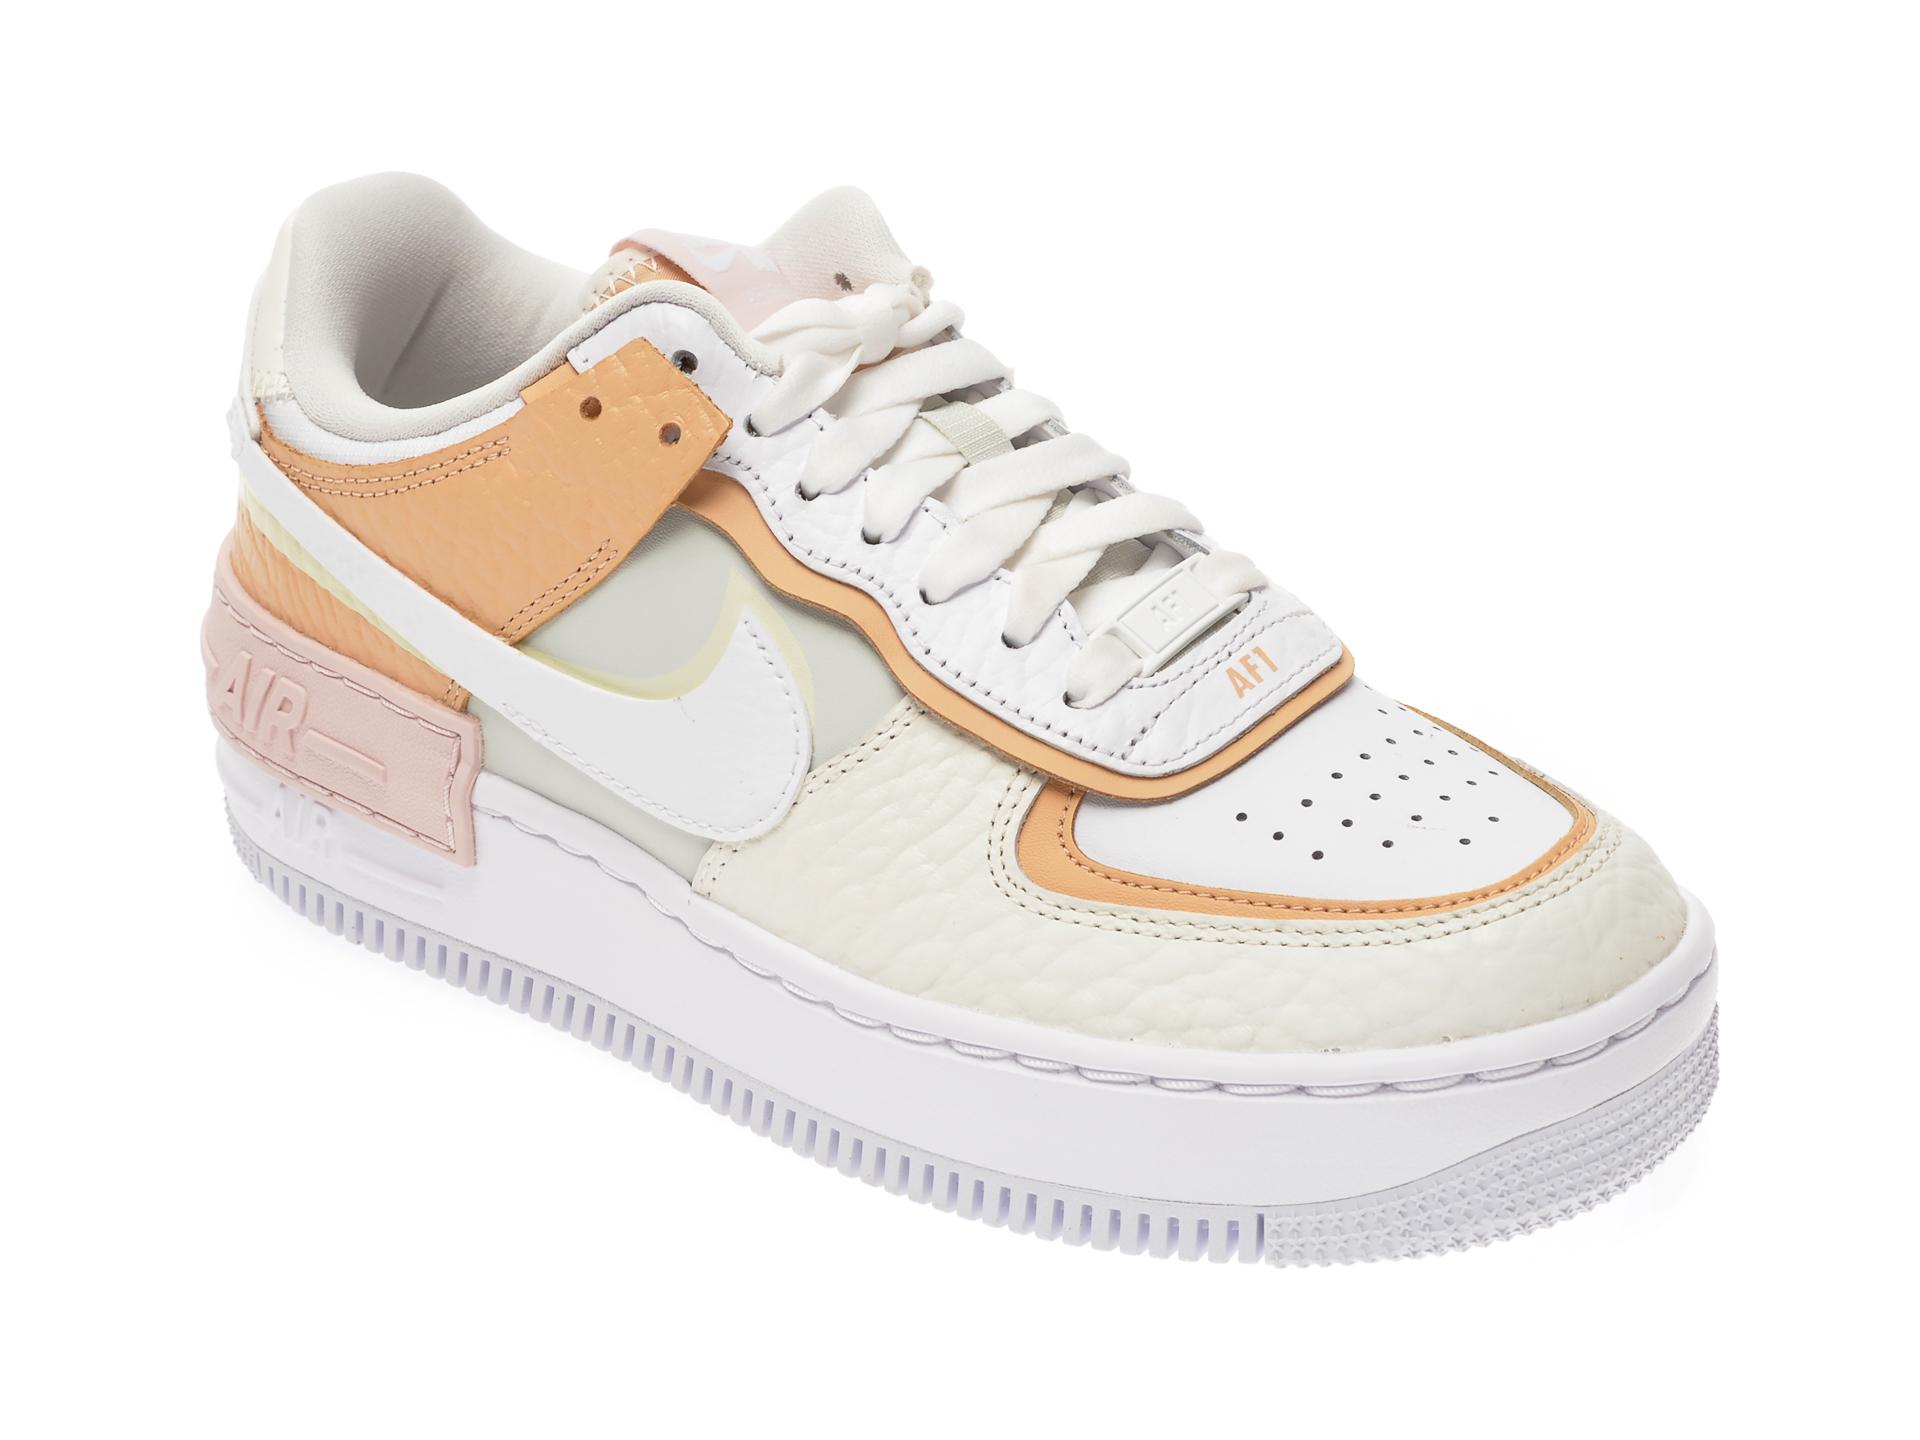 Pantofi sport NIKE albi, Af1 Shadow Se, din piele naturala